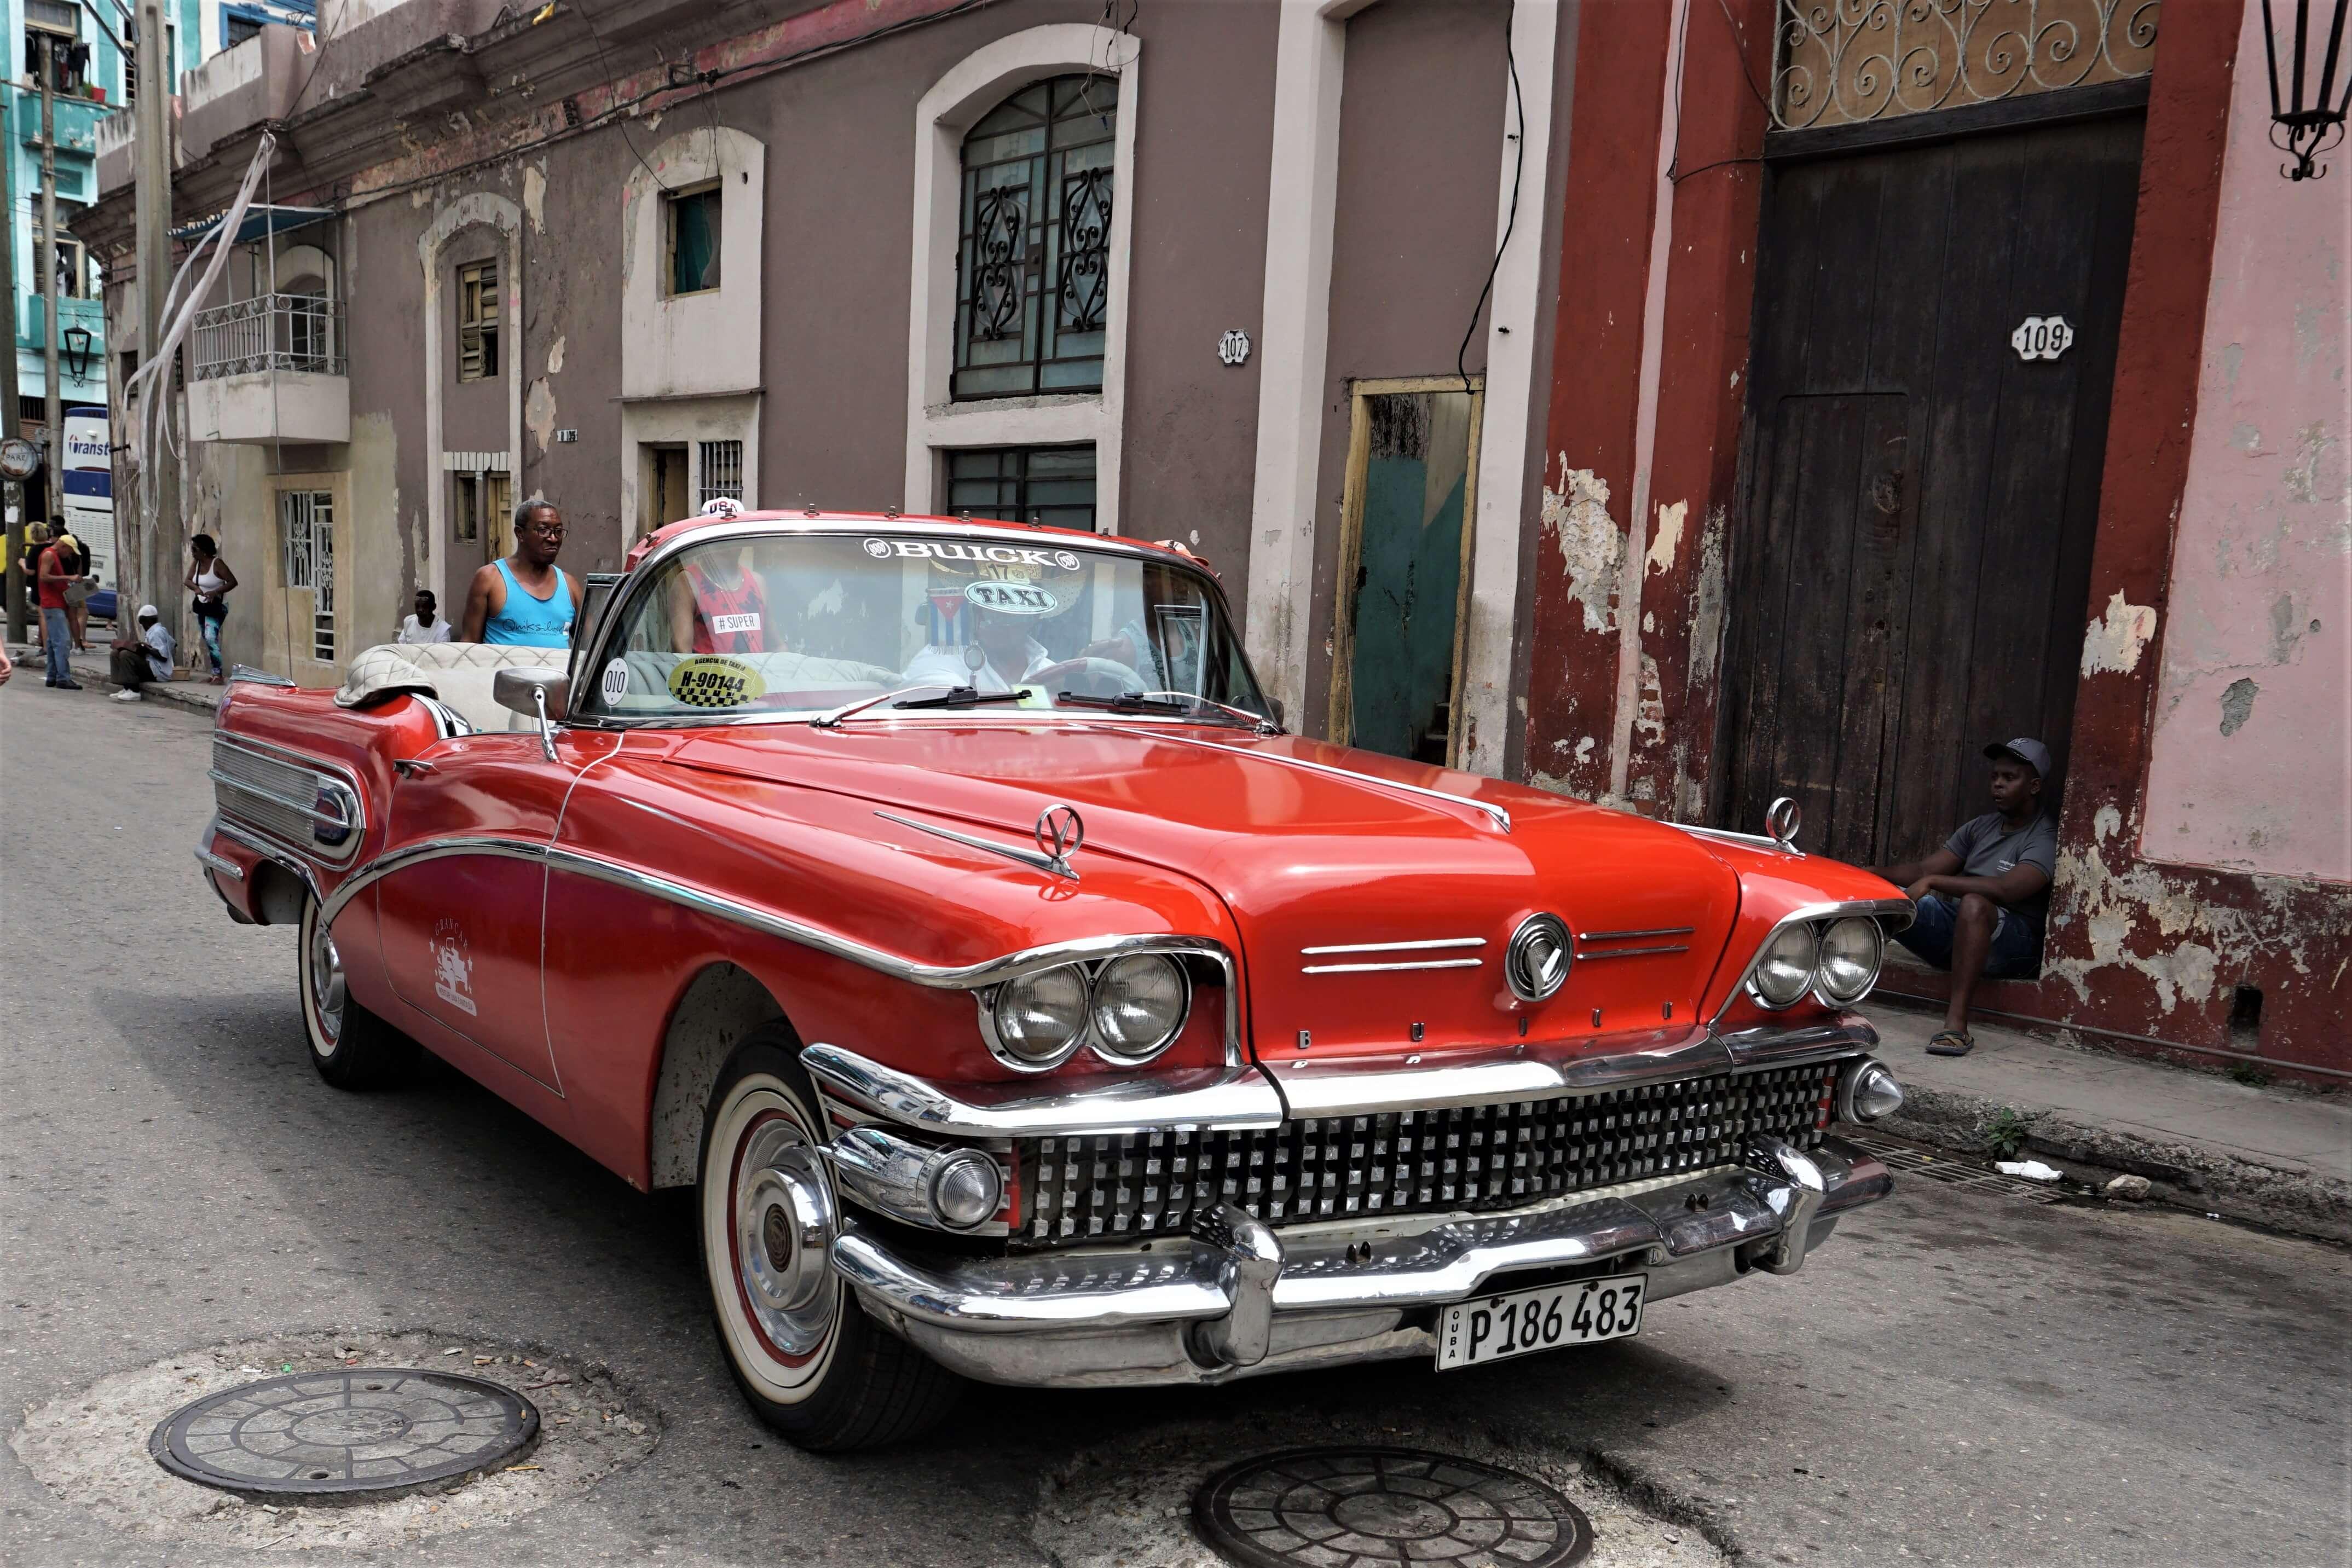 Restored car in Havana Cuba